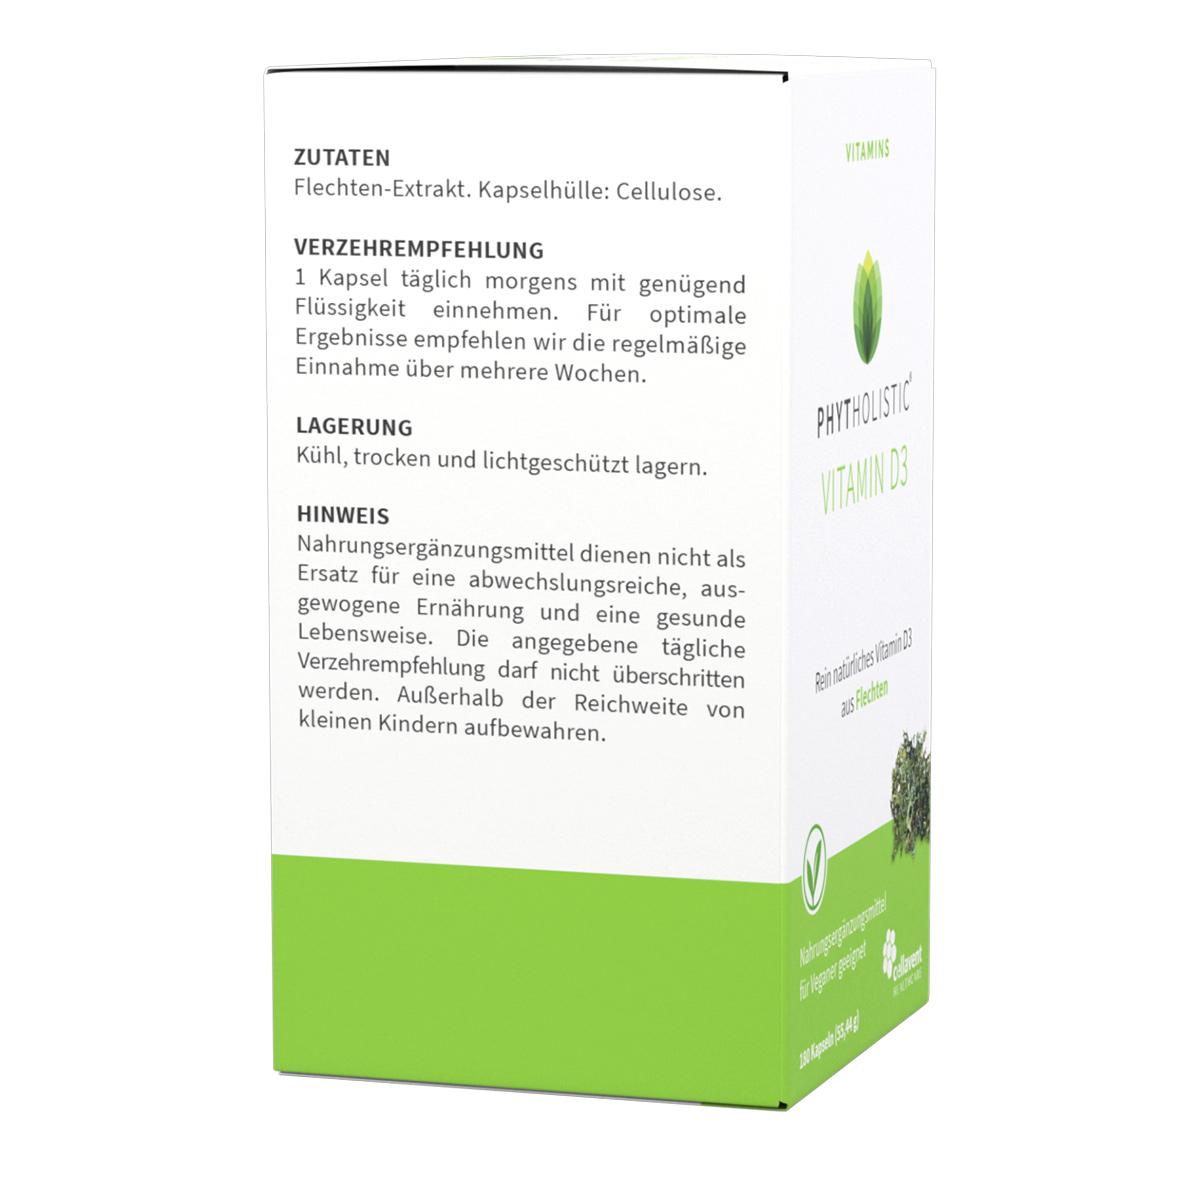 vitamin-d3-kapseln-vegan-phytholistic-180-stueck-verpackung-links-1200x1200